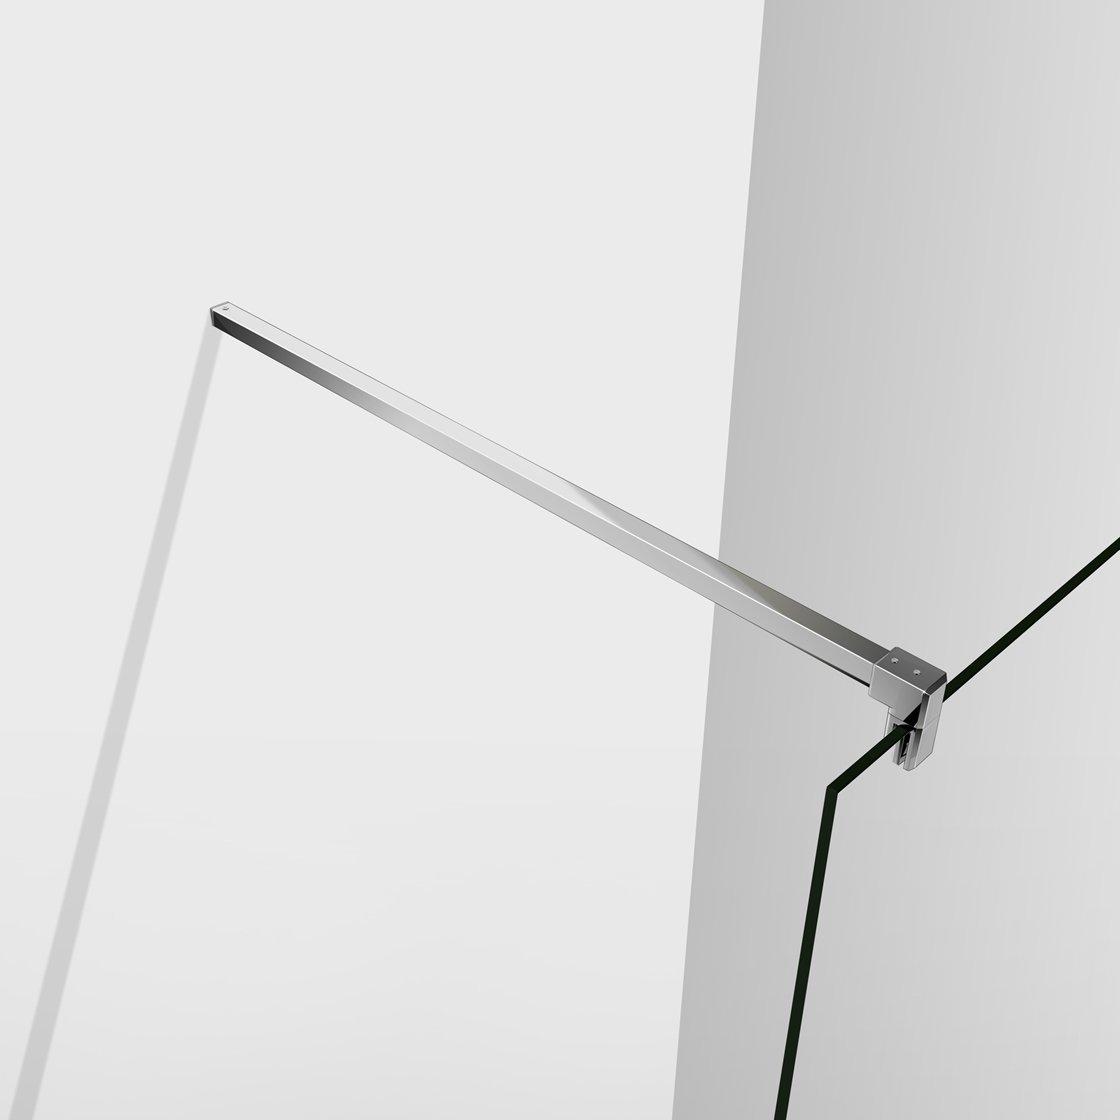 70x200cm Mamparas ducha Panel Pantalla Fija cristal 10mm templado para ba/ño